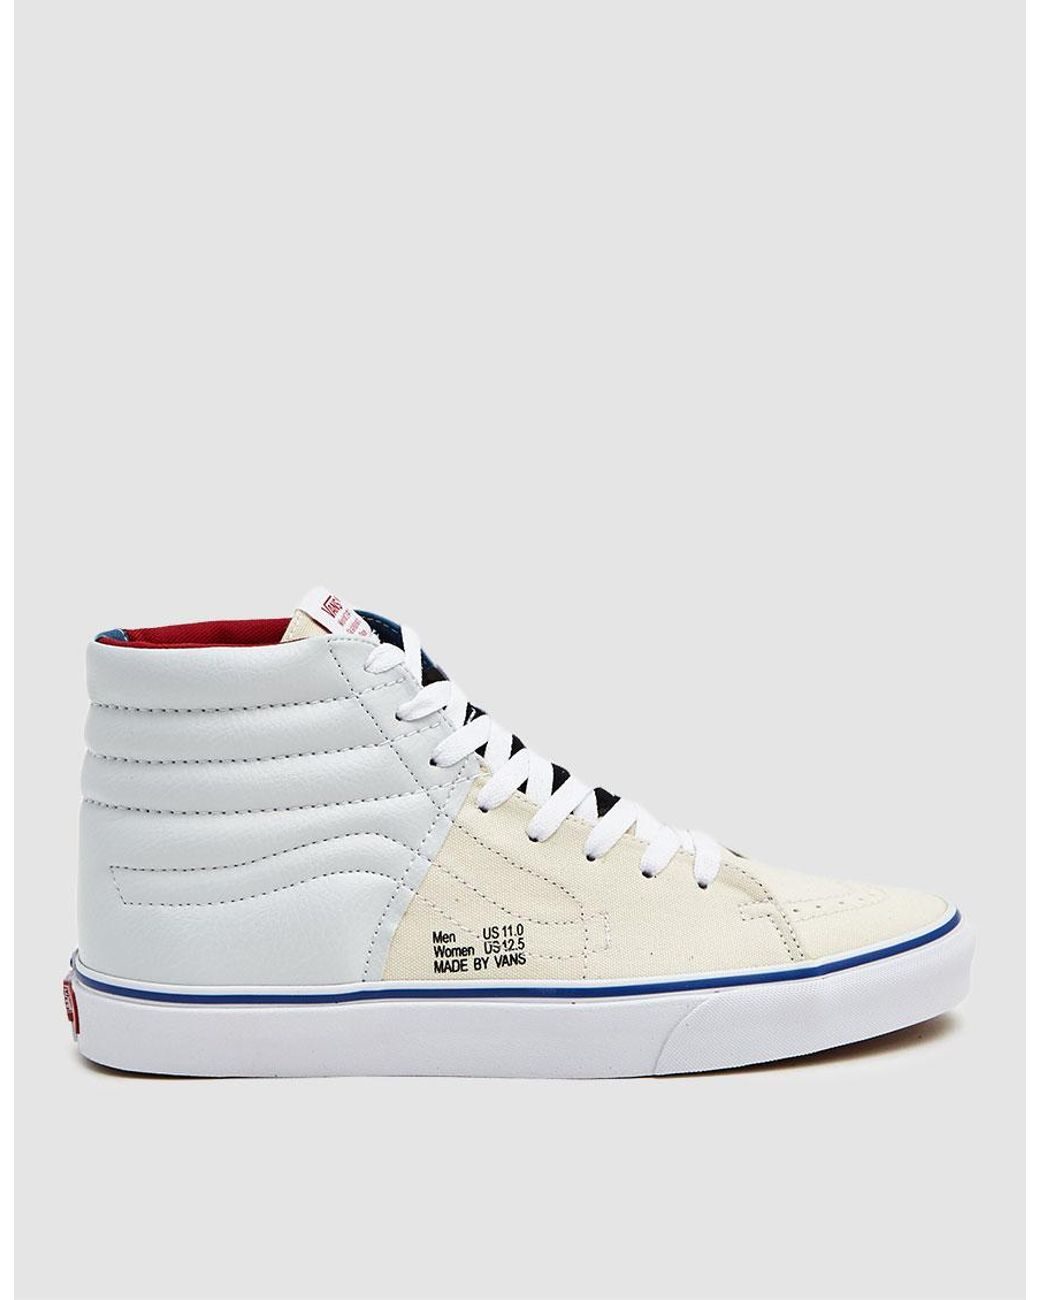 0745378508 Lyst - Vans Outside In Sk8-hi Sneaker for Men